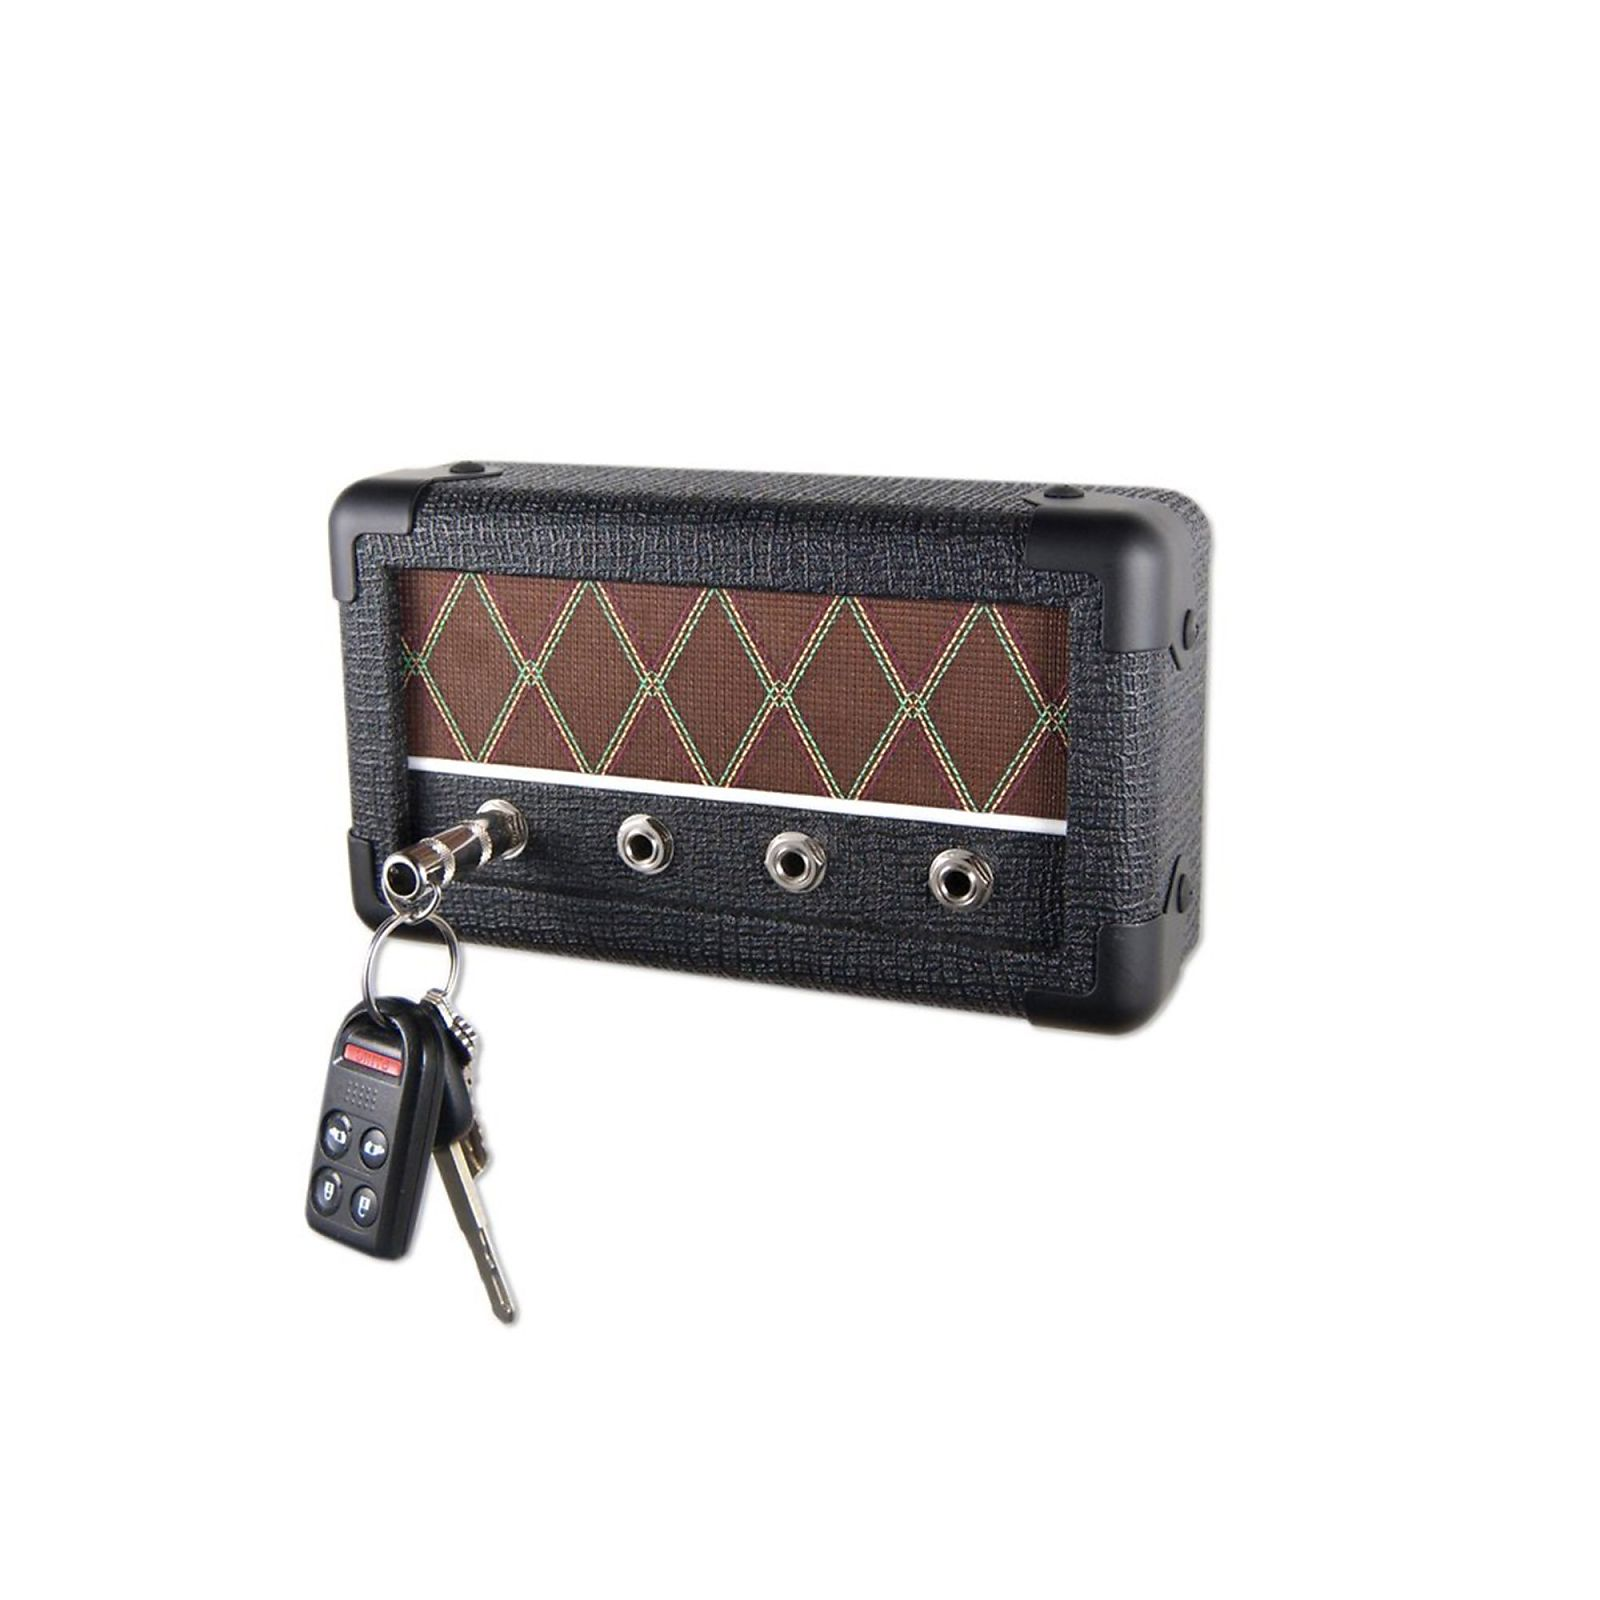 Droplight combo series black diamond guitar amp wall mounted key holder w 4 keychains